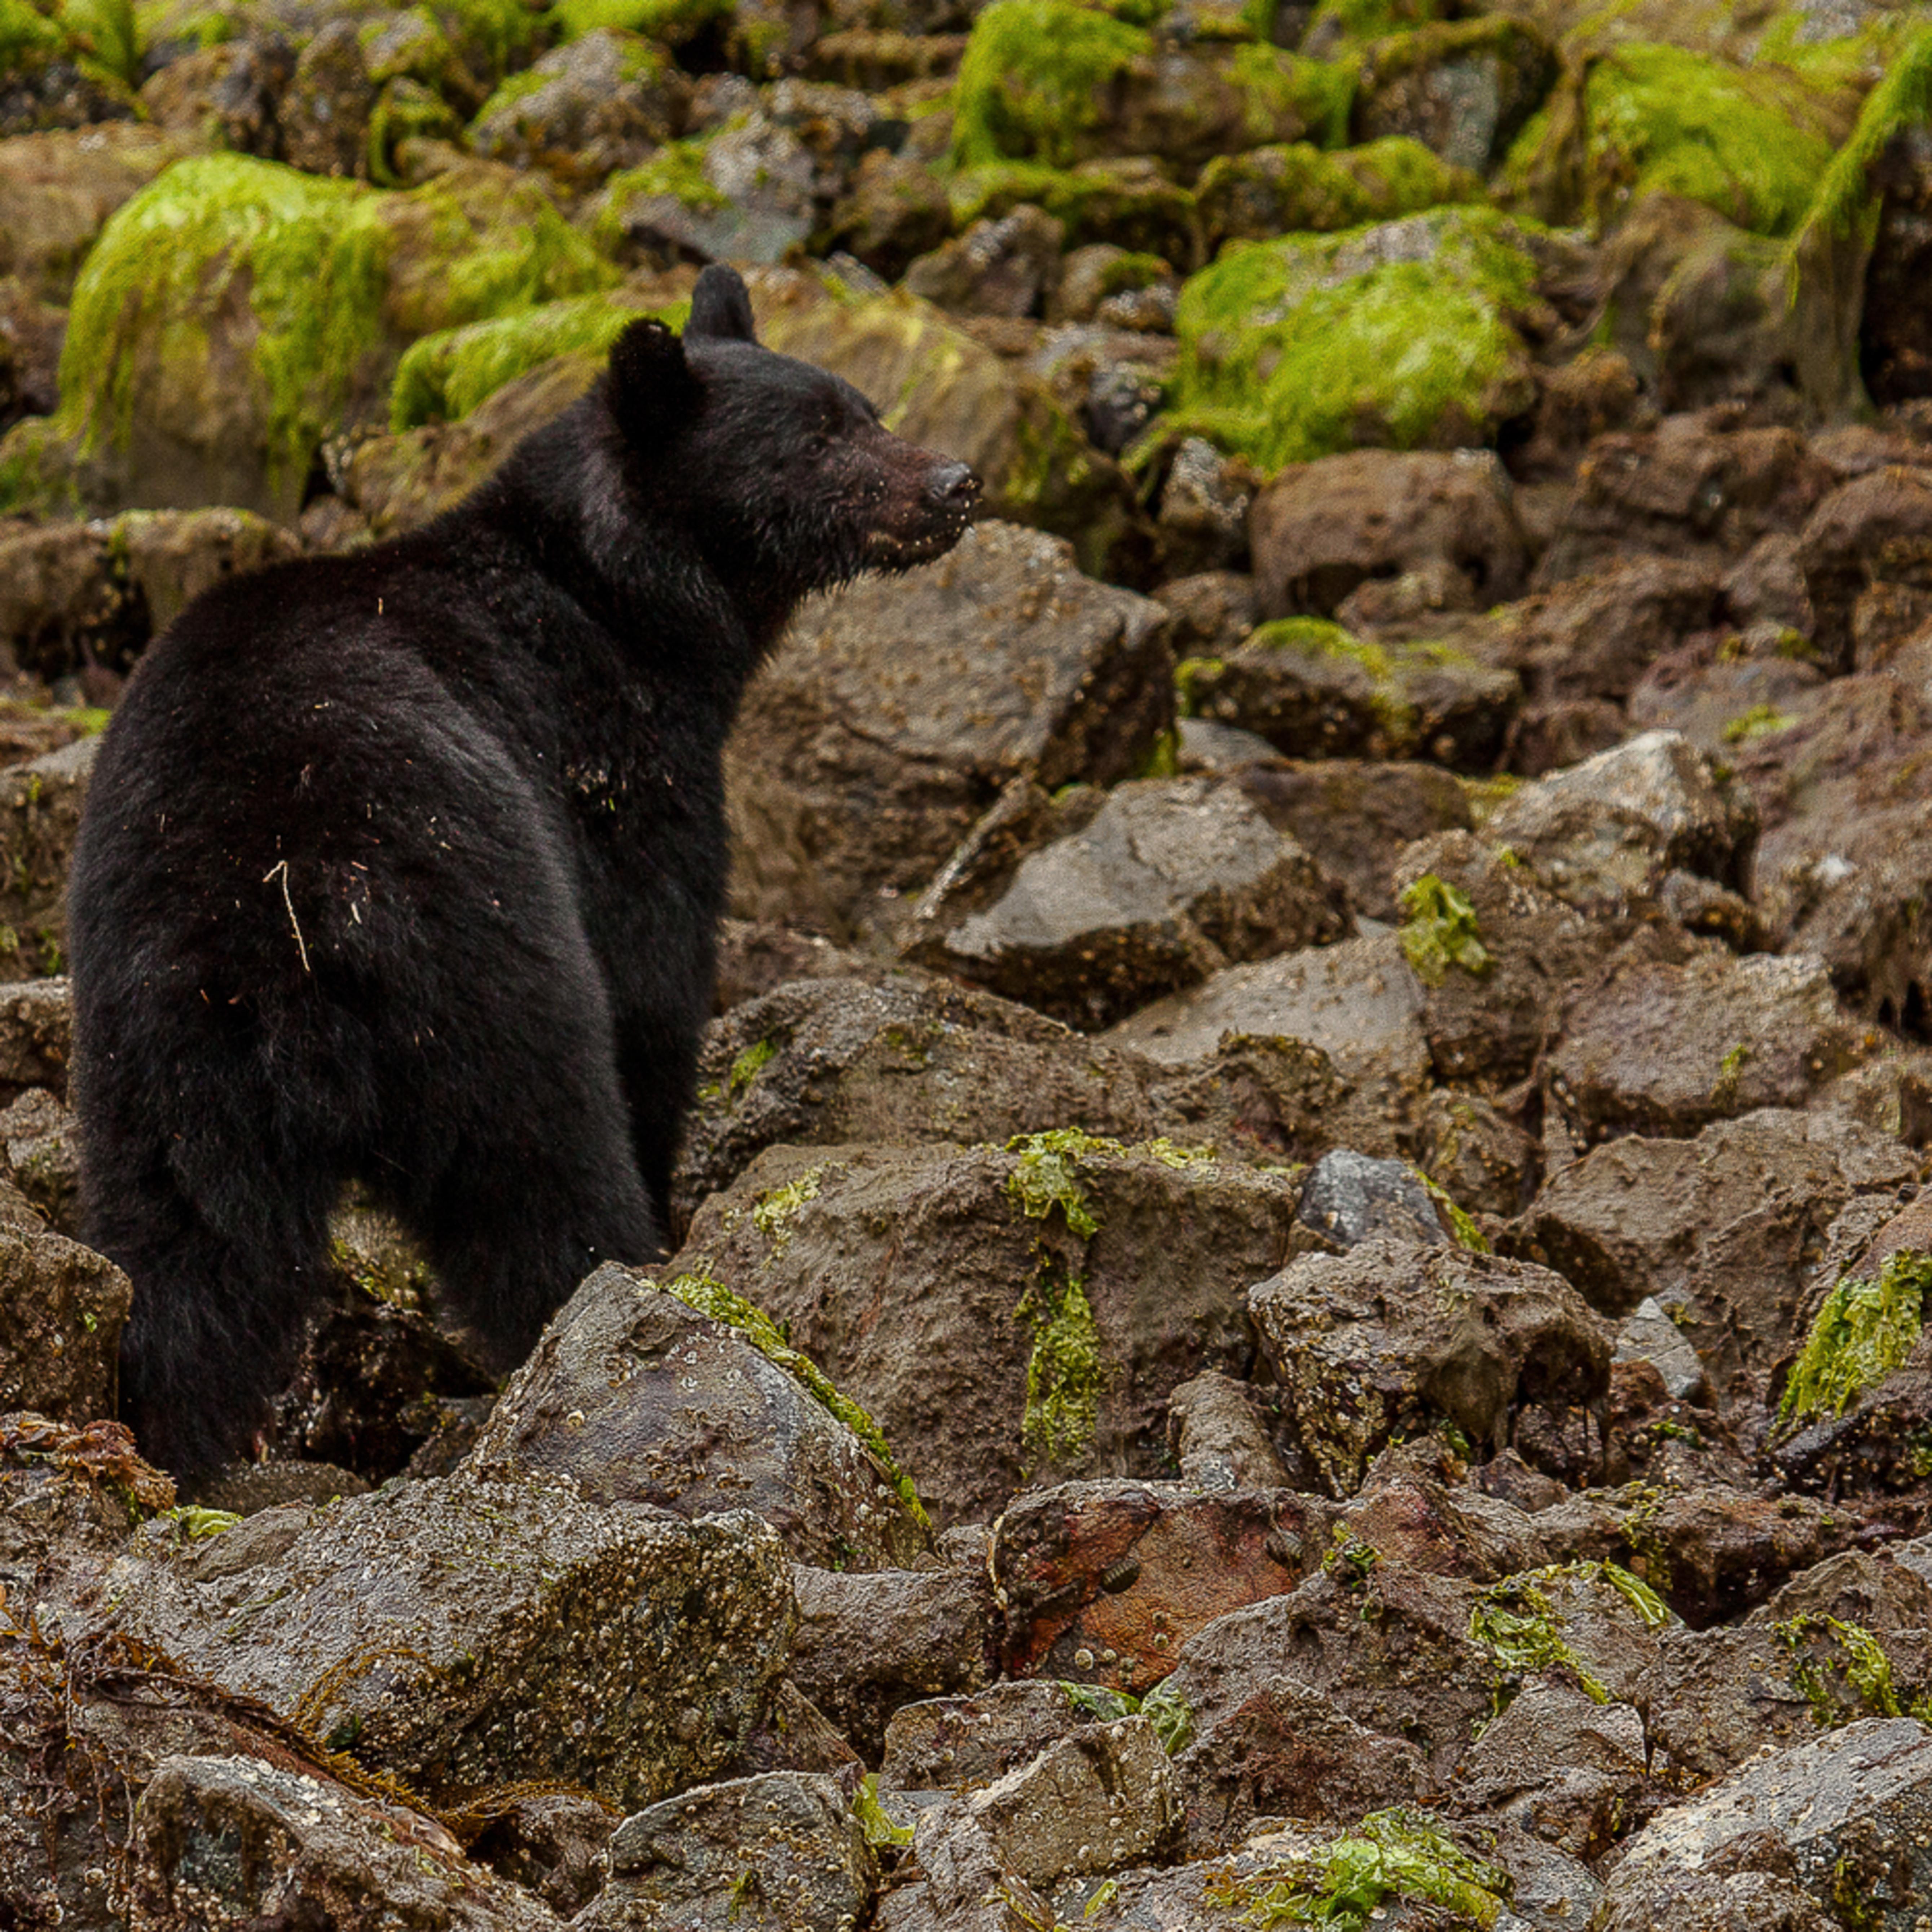 Black bear zlj8qk